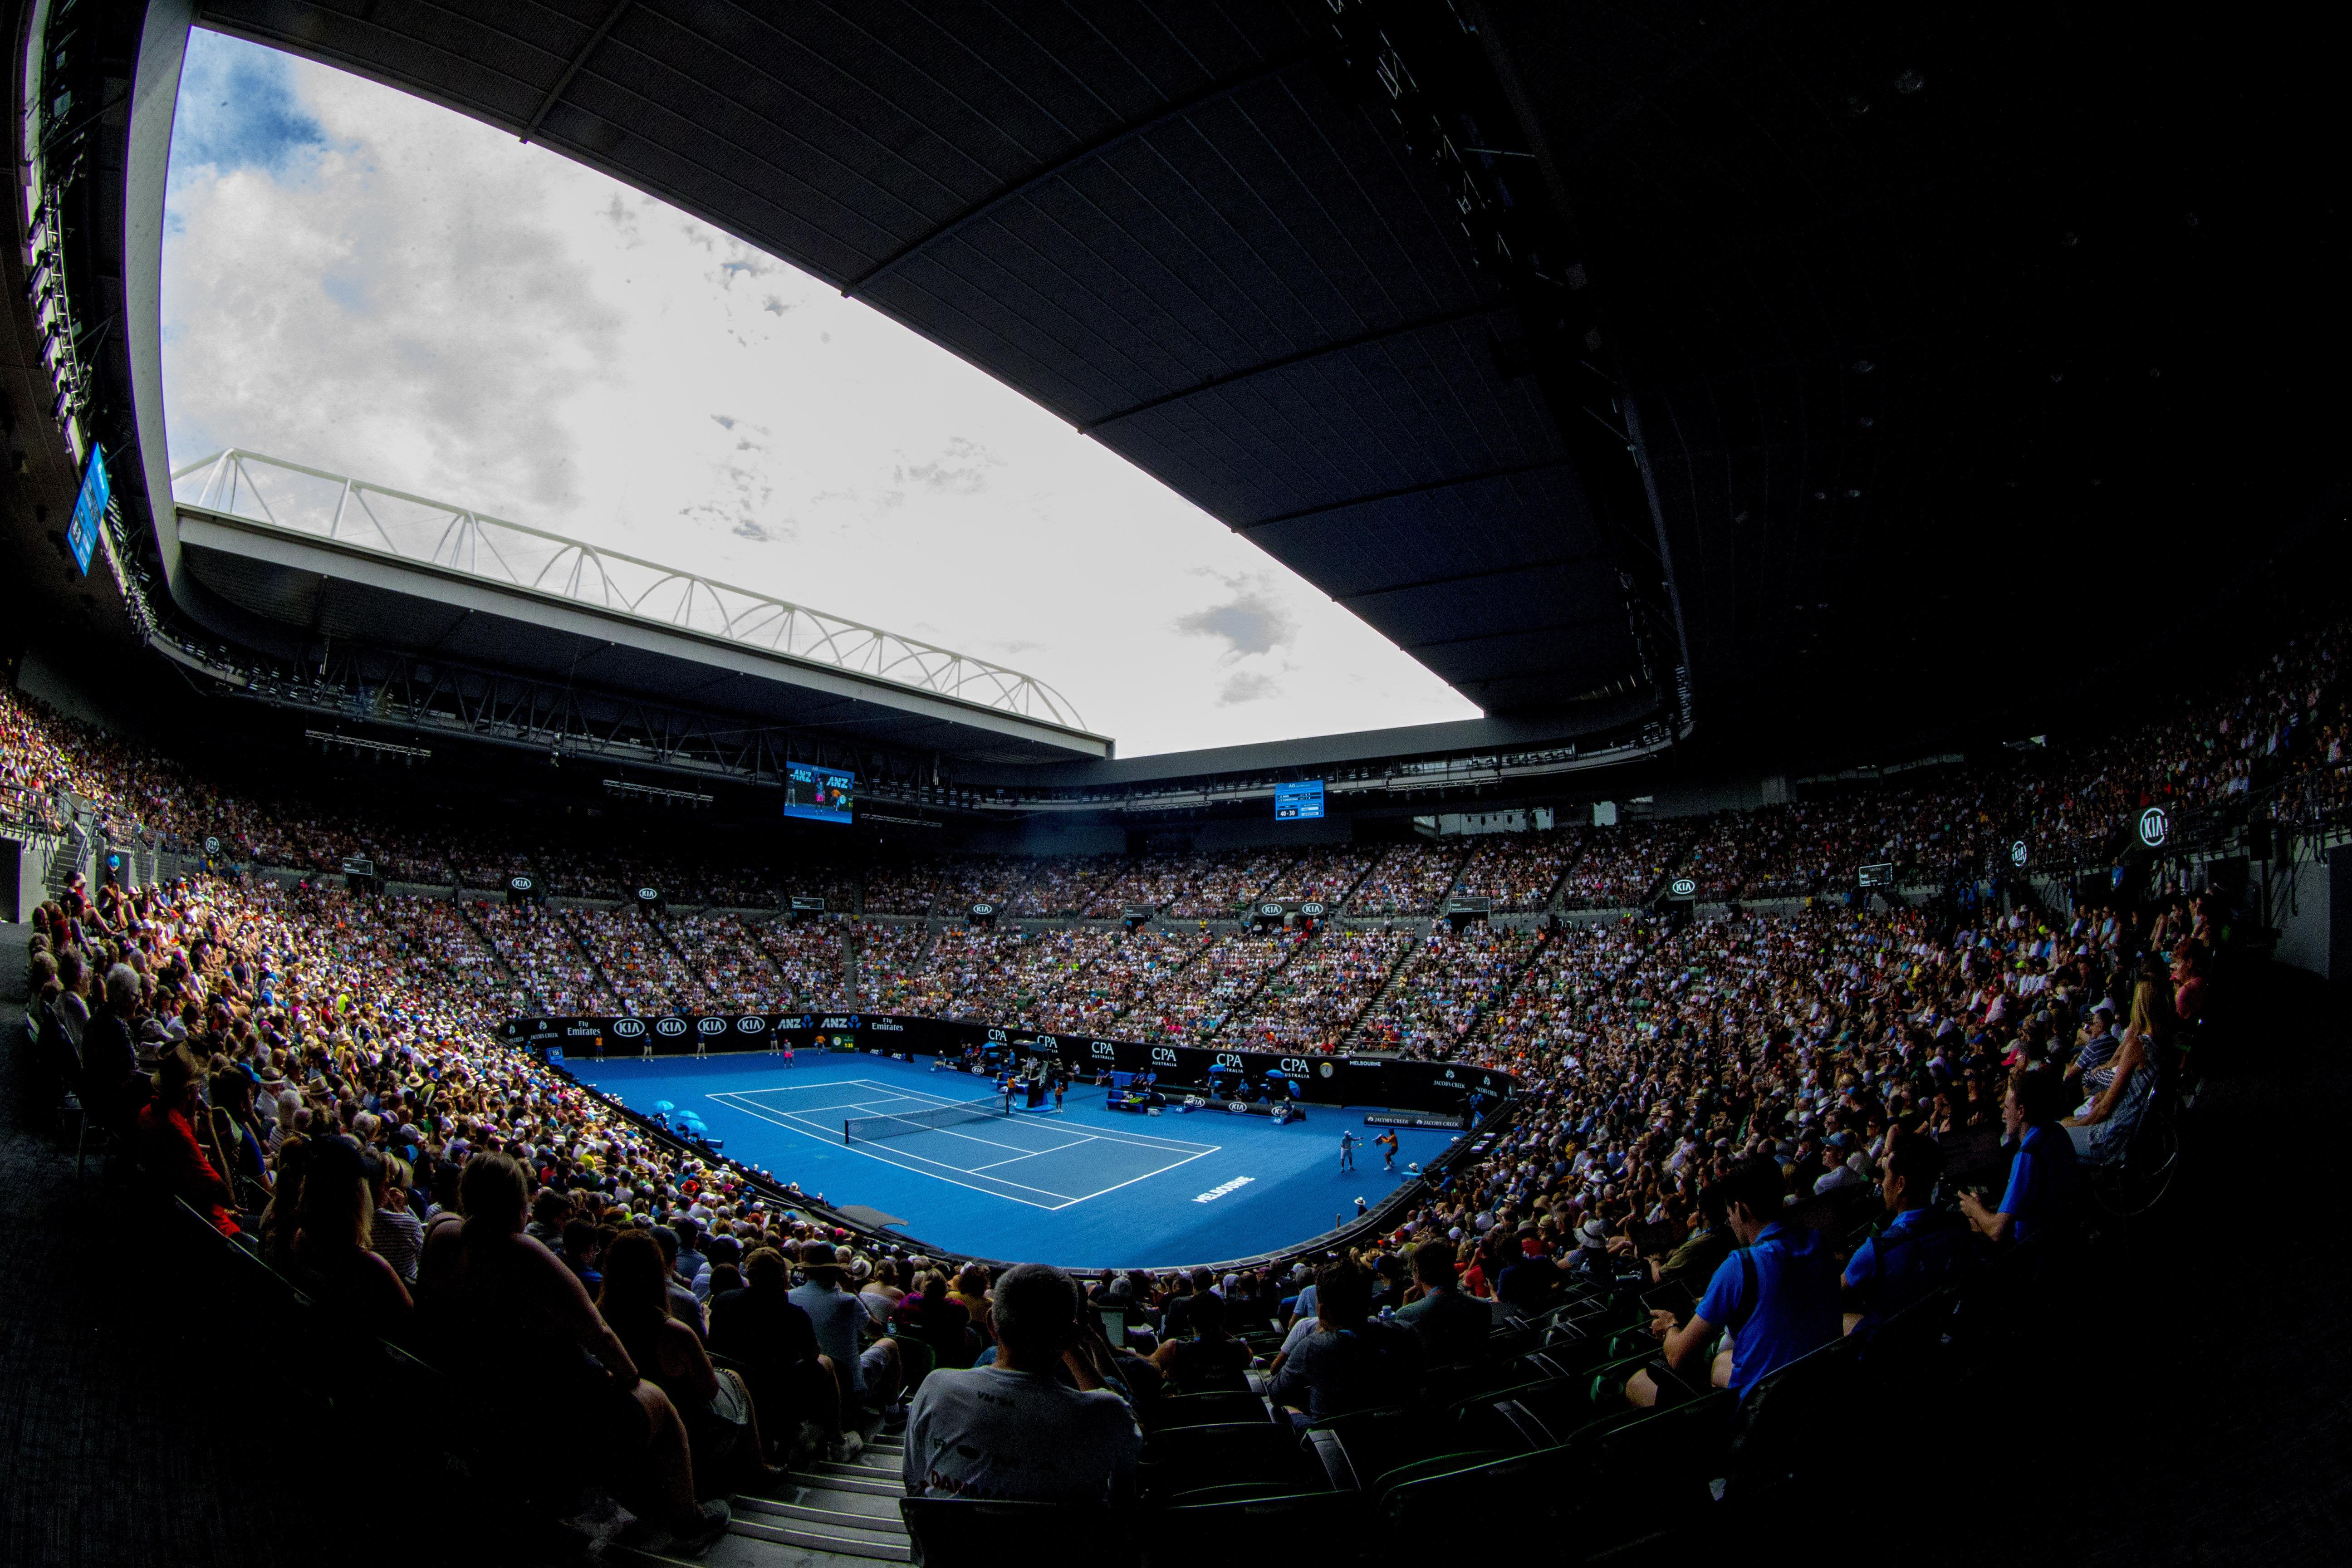 Tennis - Open Australie - Open d'Australie : Petite révolution à venir ?